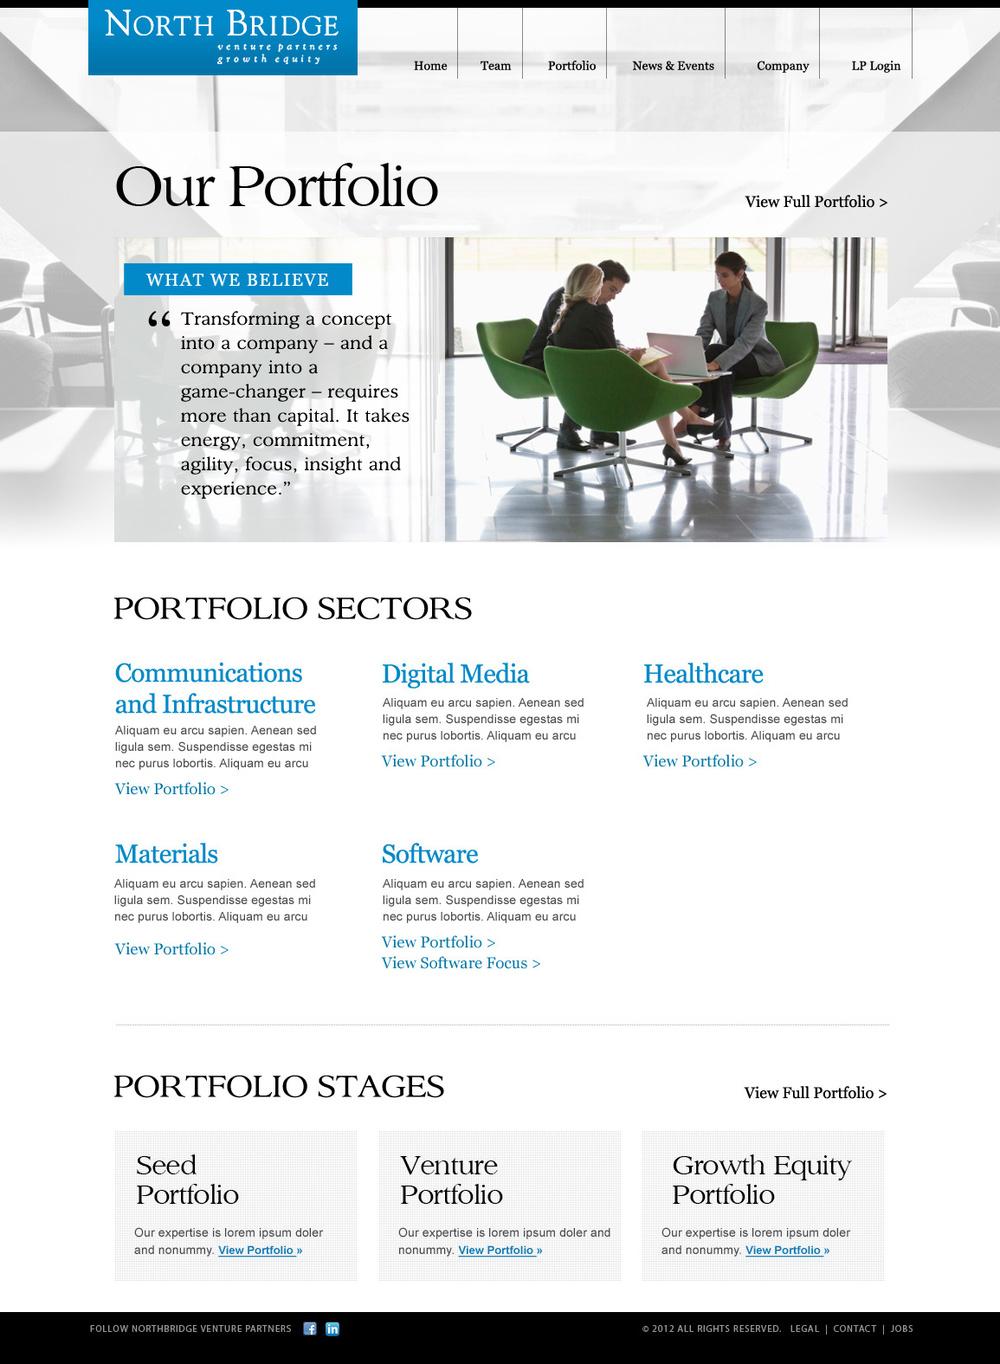 1_PortfolioLanding.jpg